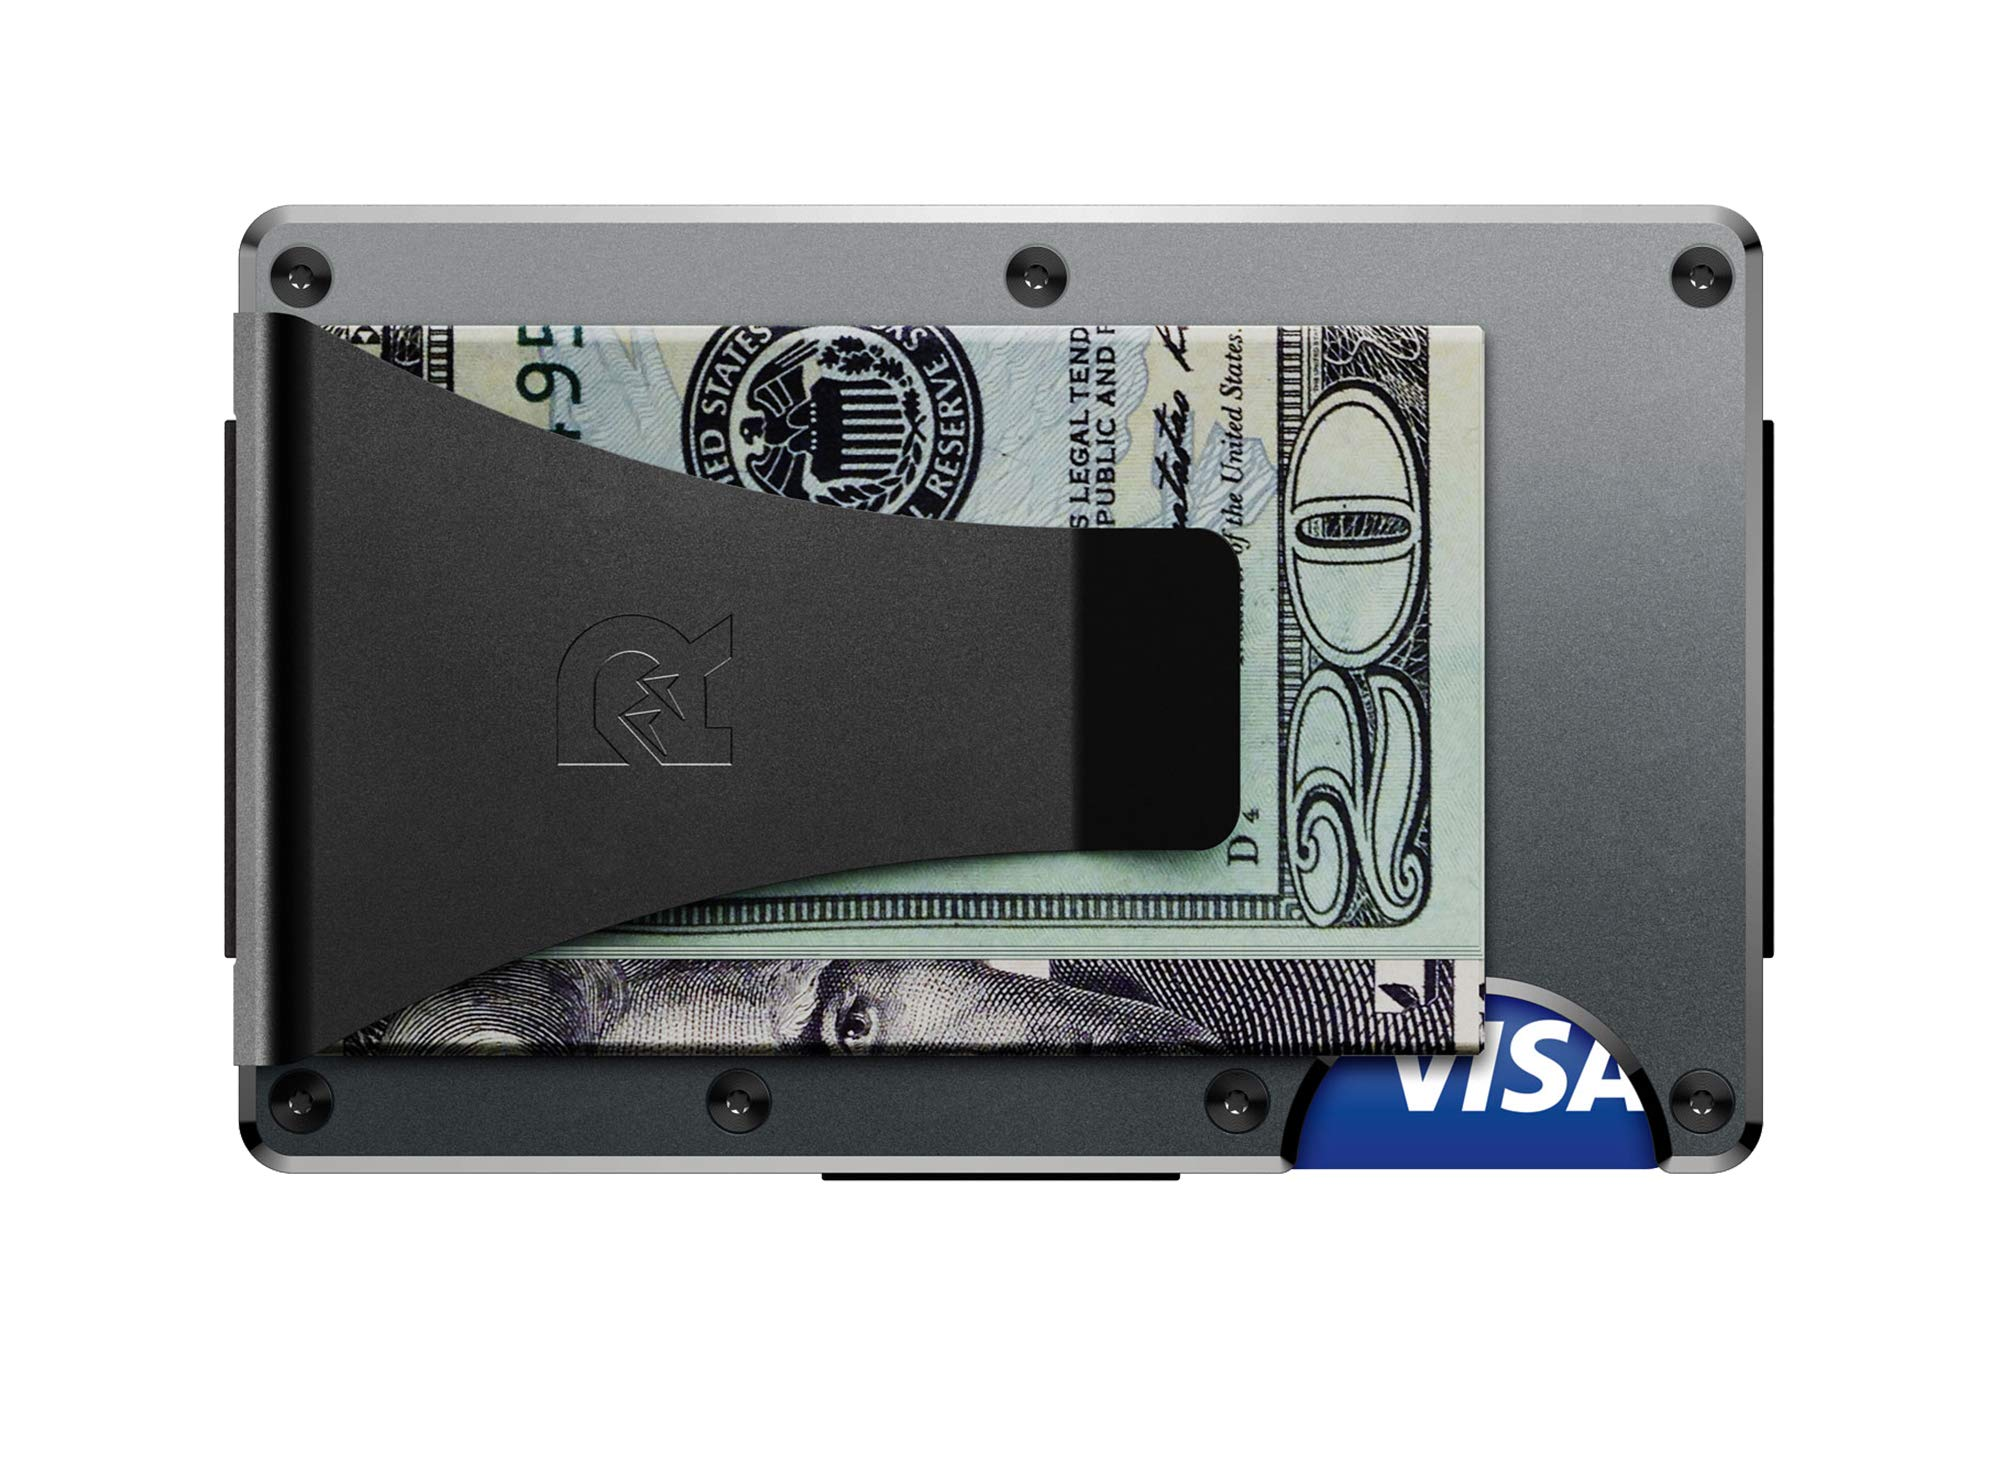 The Ridge Authentic Minimalist Metal RFID Blocking Wallet - Money Clip (Gunmetal)